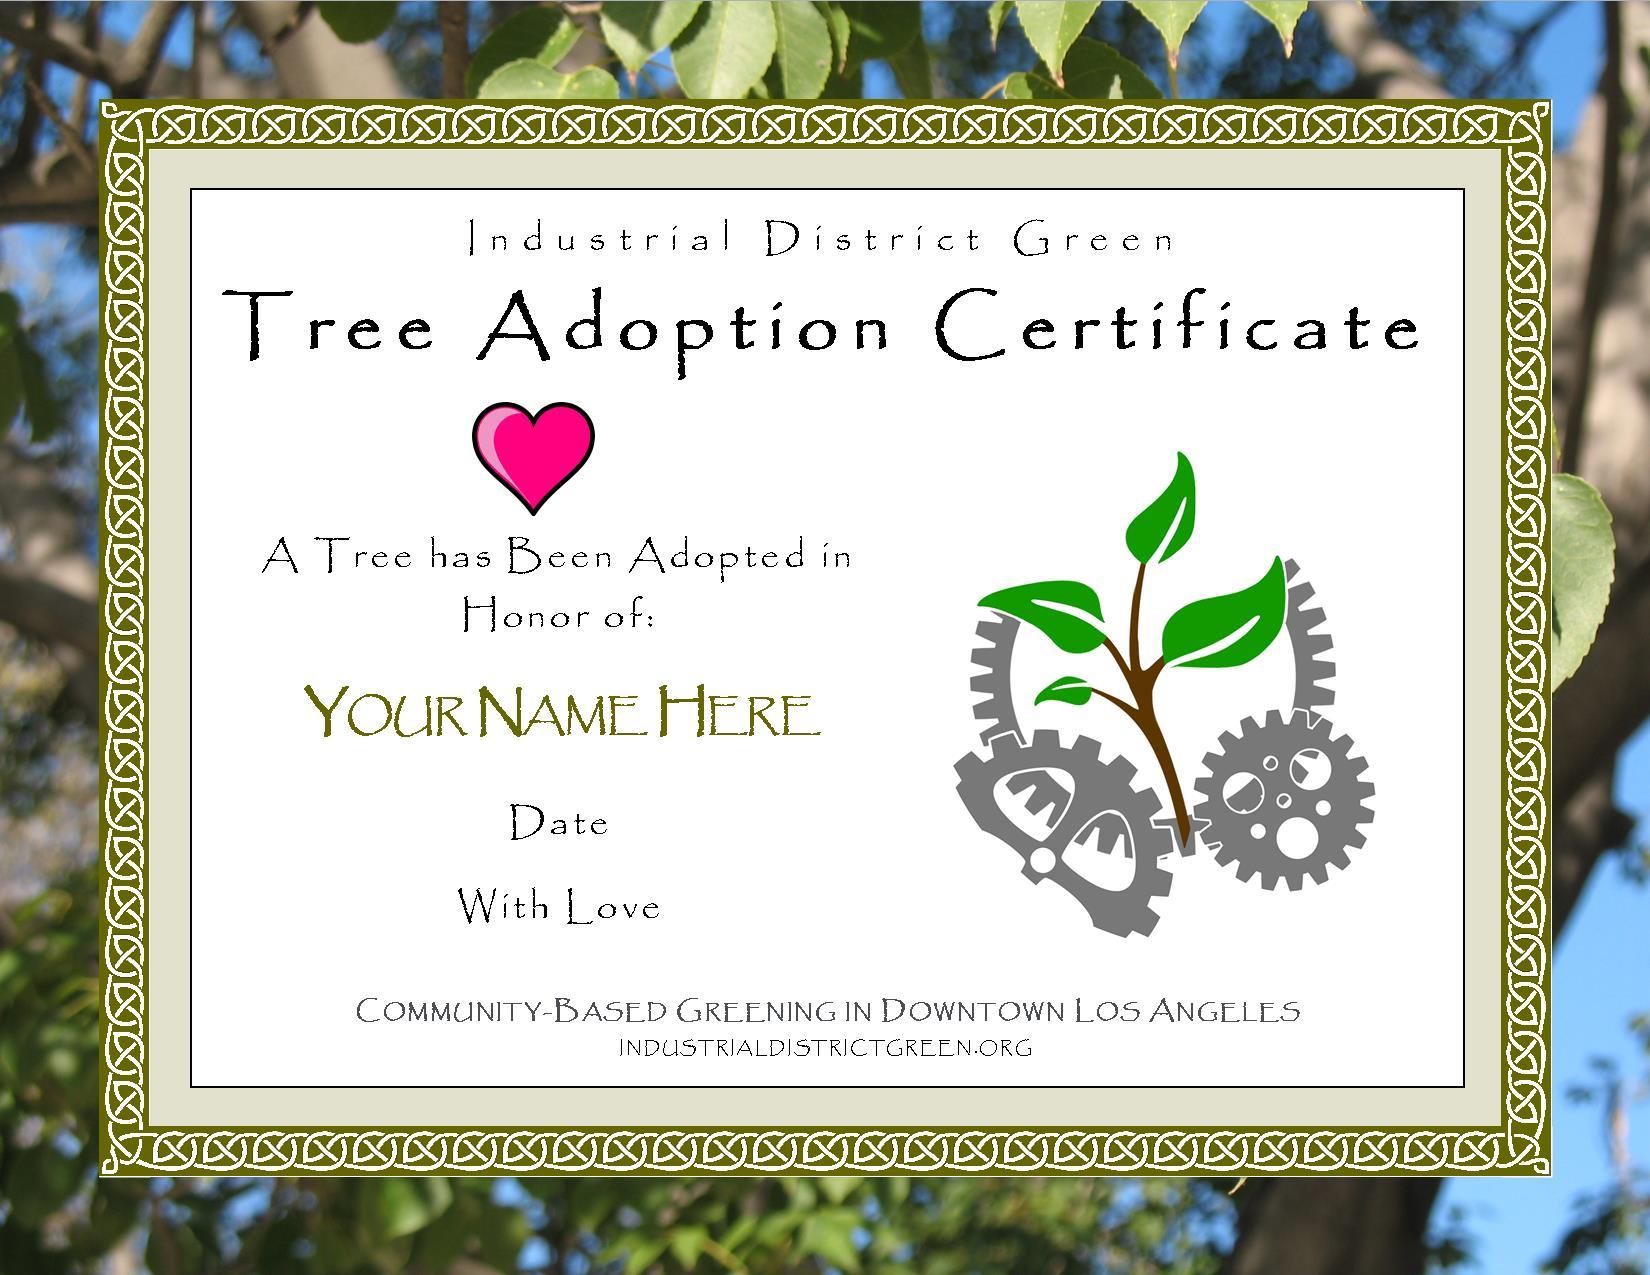 IDG_Tree_Adoption_Certificate.jpg